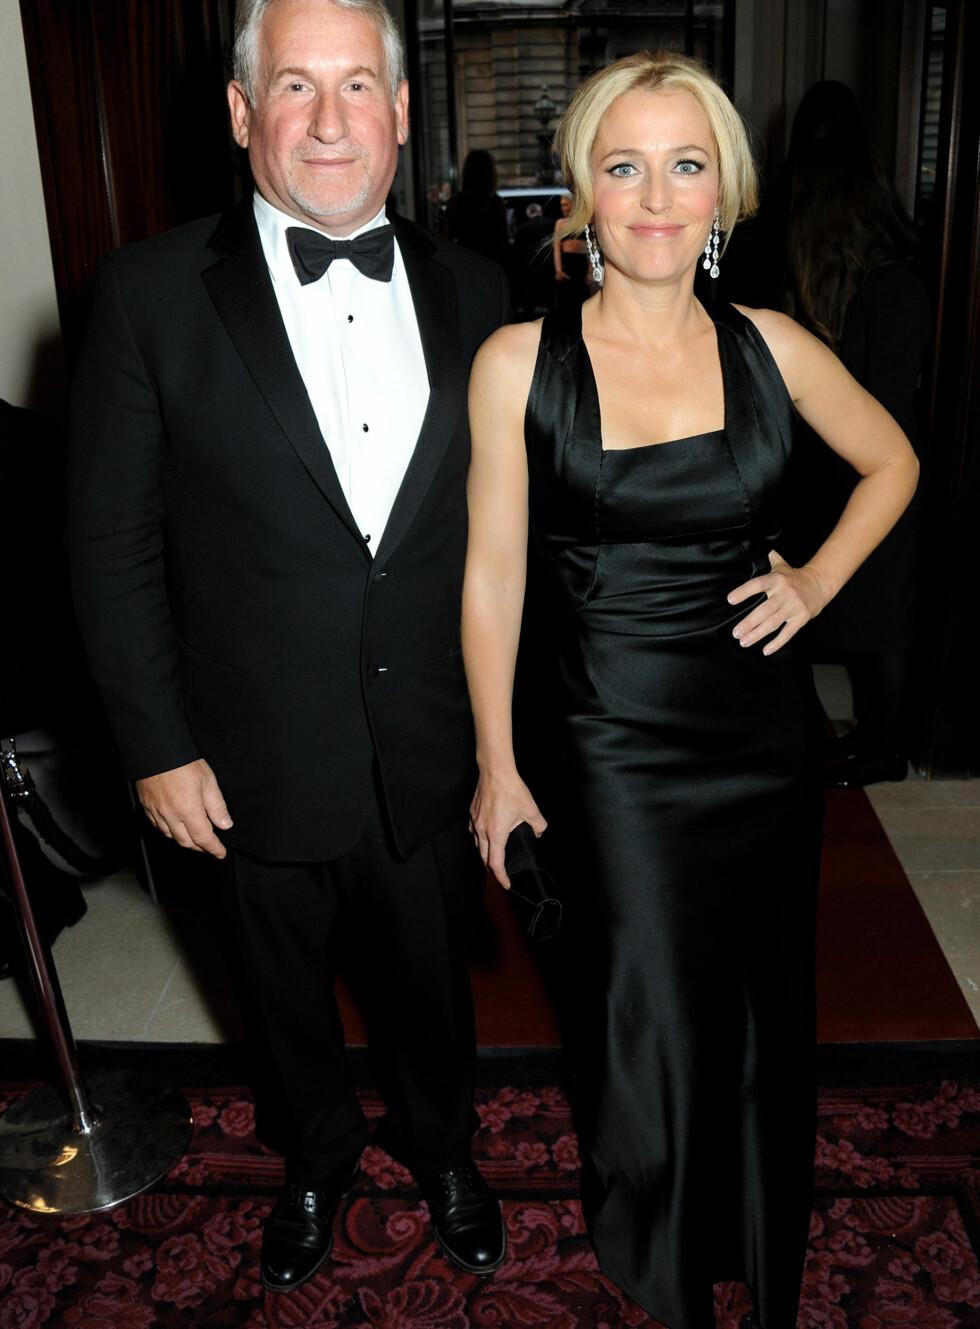 Simon Kelner og Gillian Anderson Foto: Getty Images/Getty Images/All Over Press